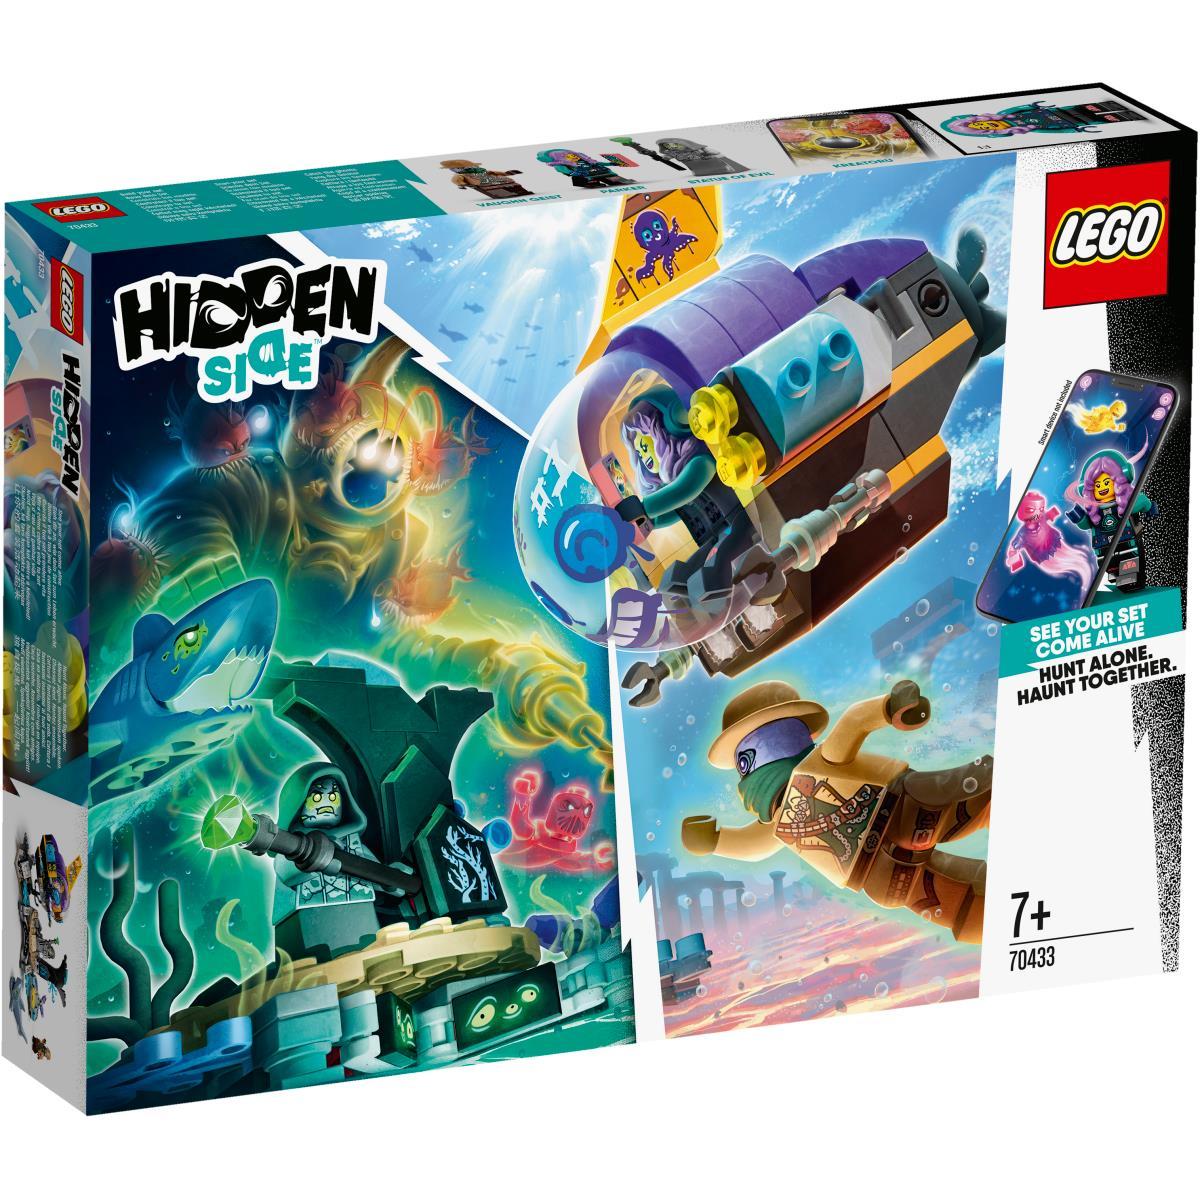 lego-hidden-side-70433-j-b-s-ubat (2)